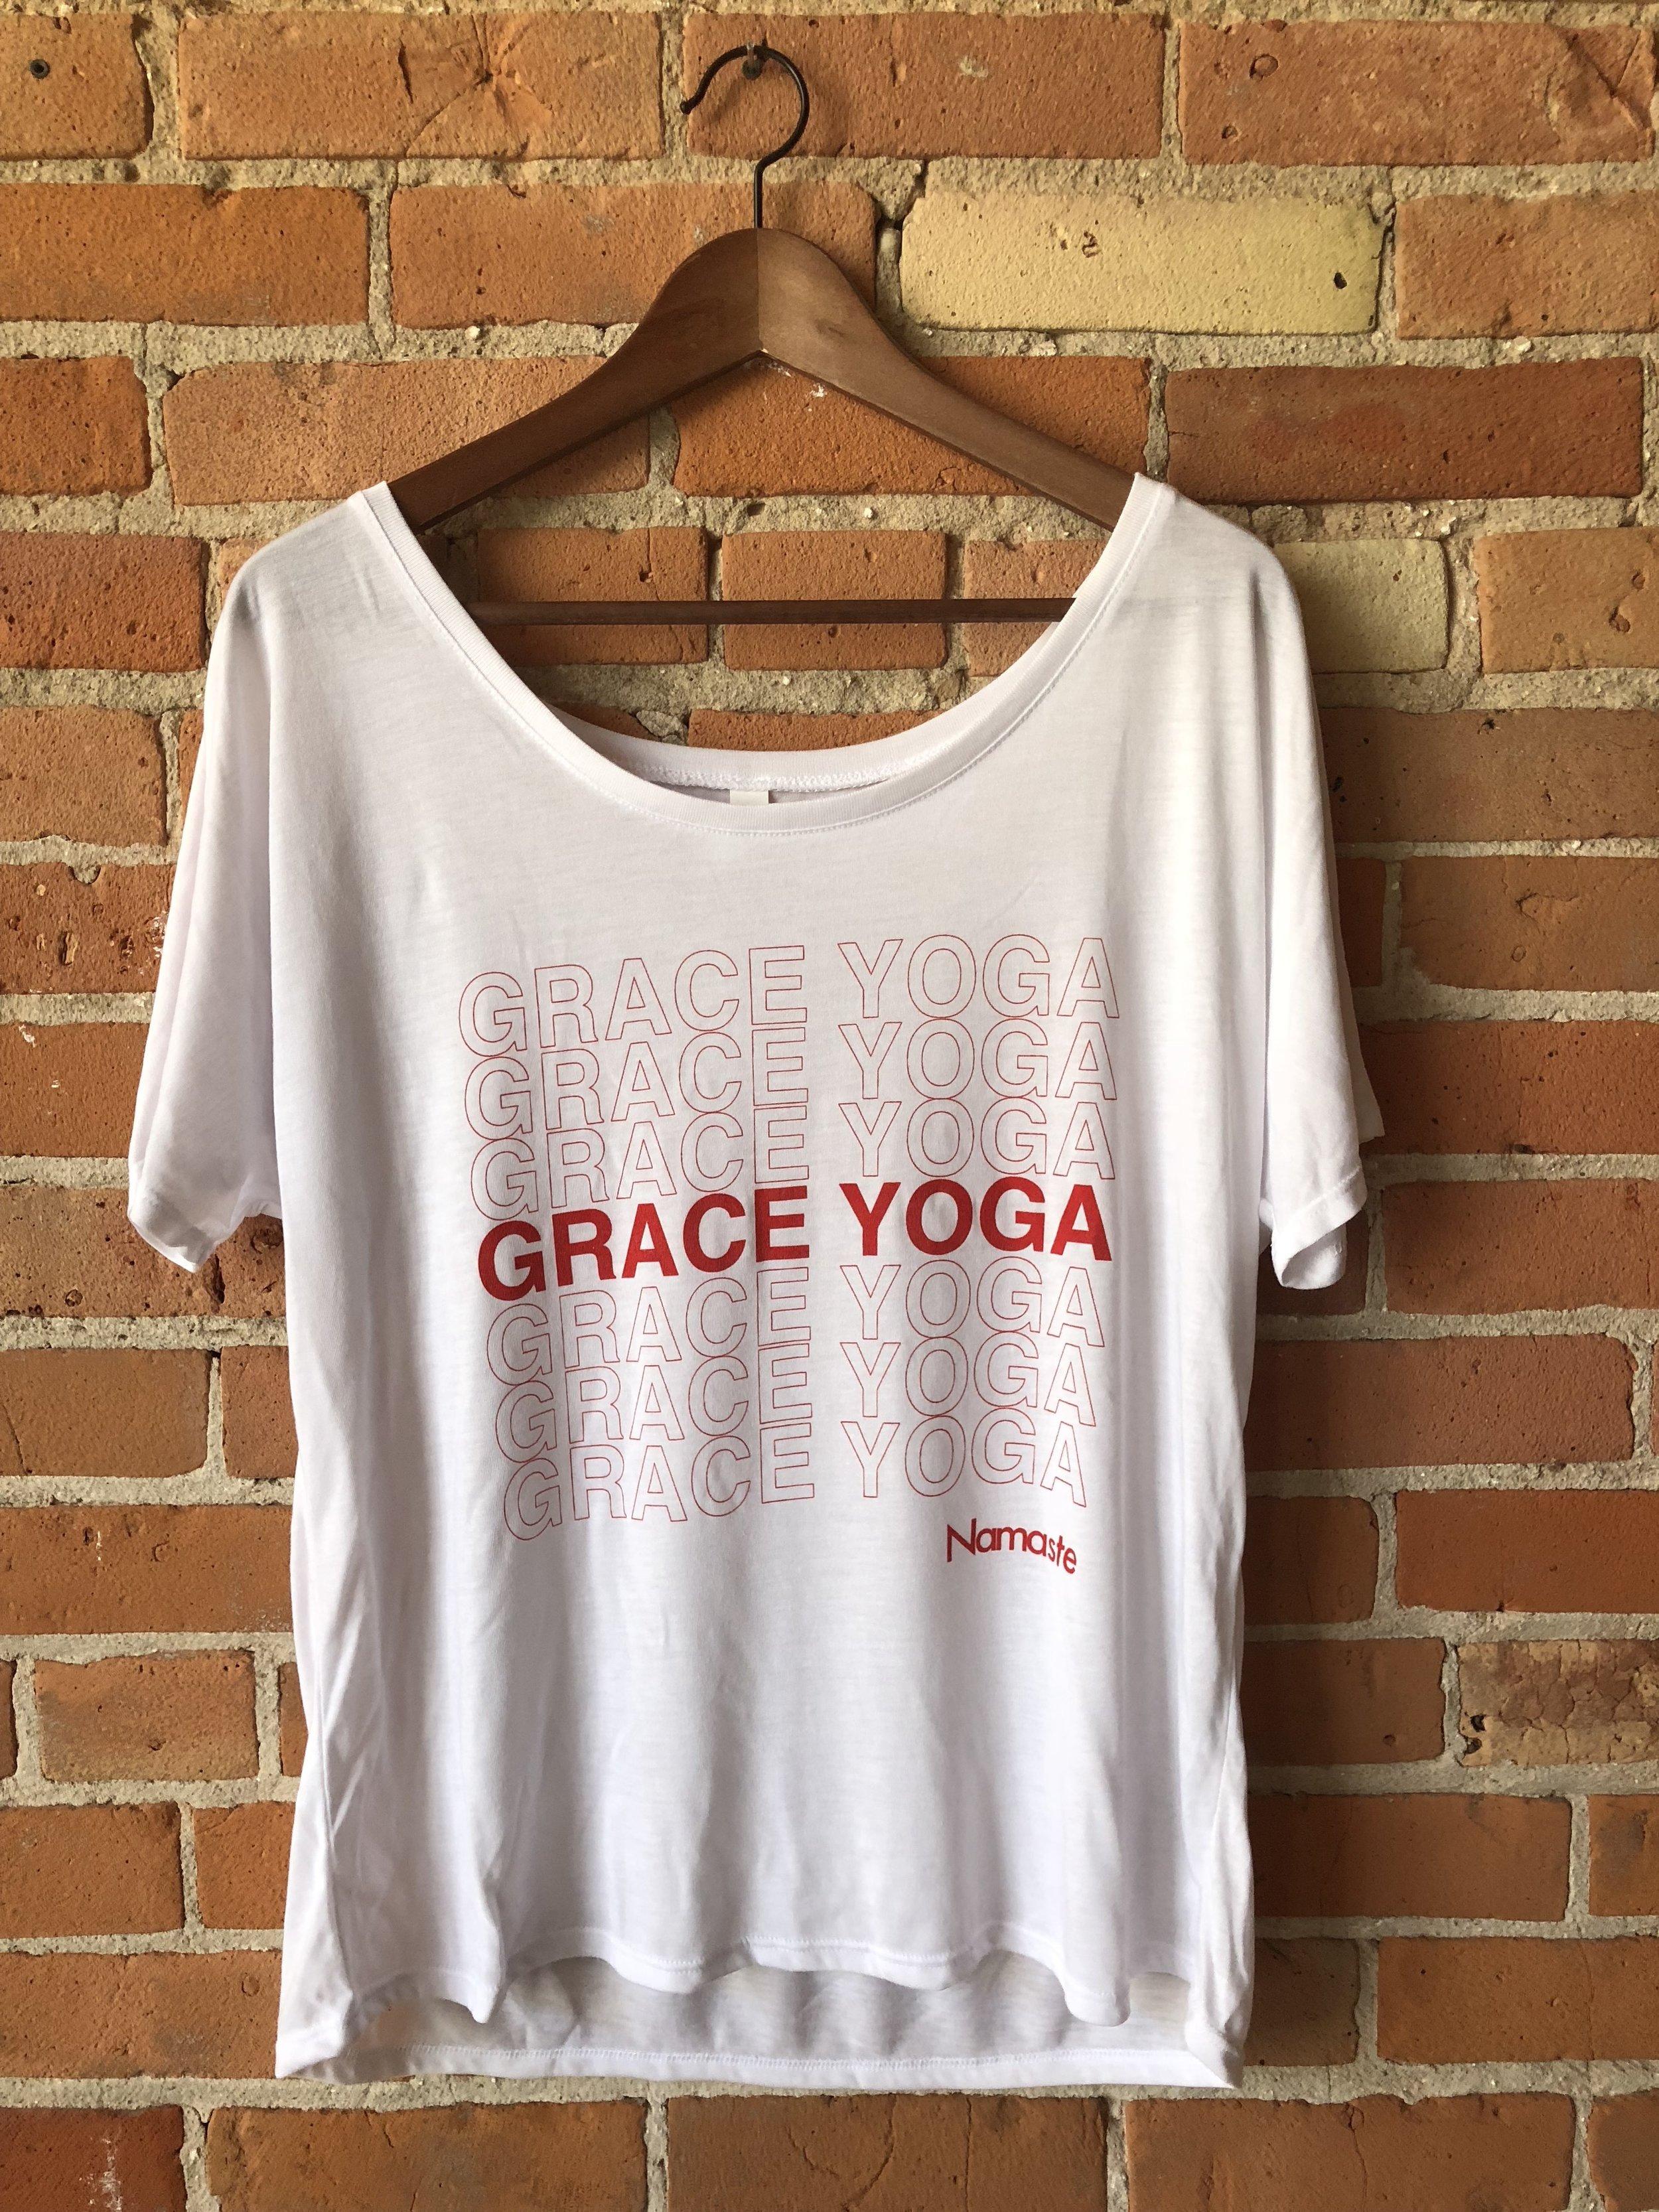 - Grace Yoga Plastic Bag Boat- Neck T-Shirt$18